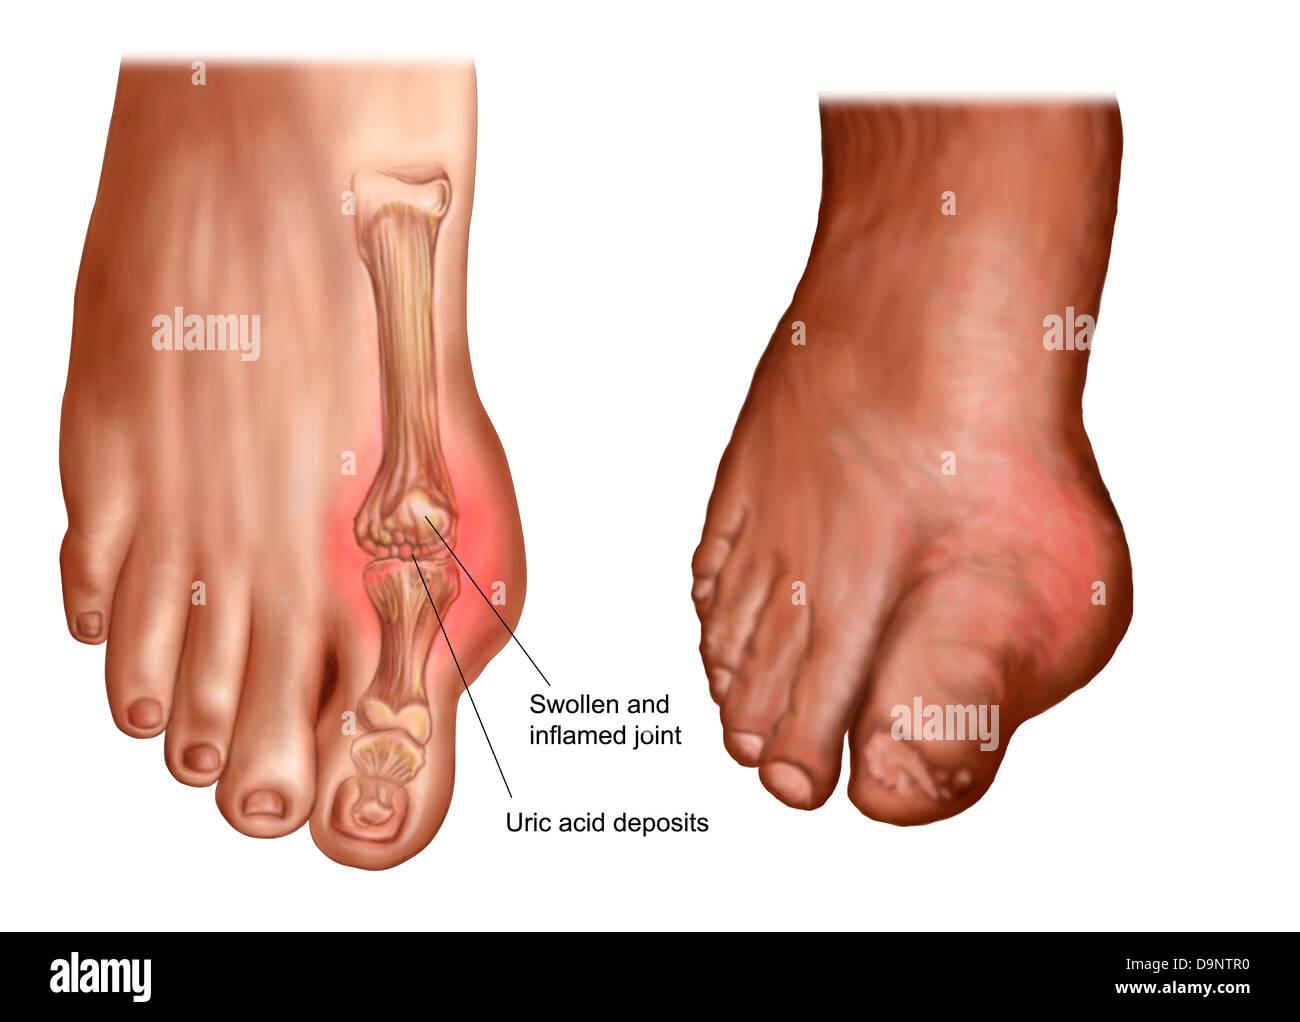 Anatomy of a swollen foot Stock Photo: 57643460 - Alamy